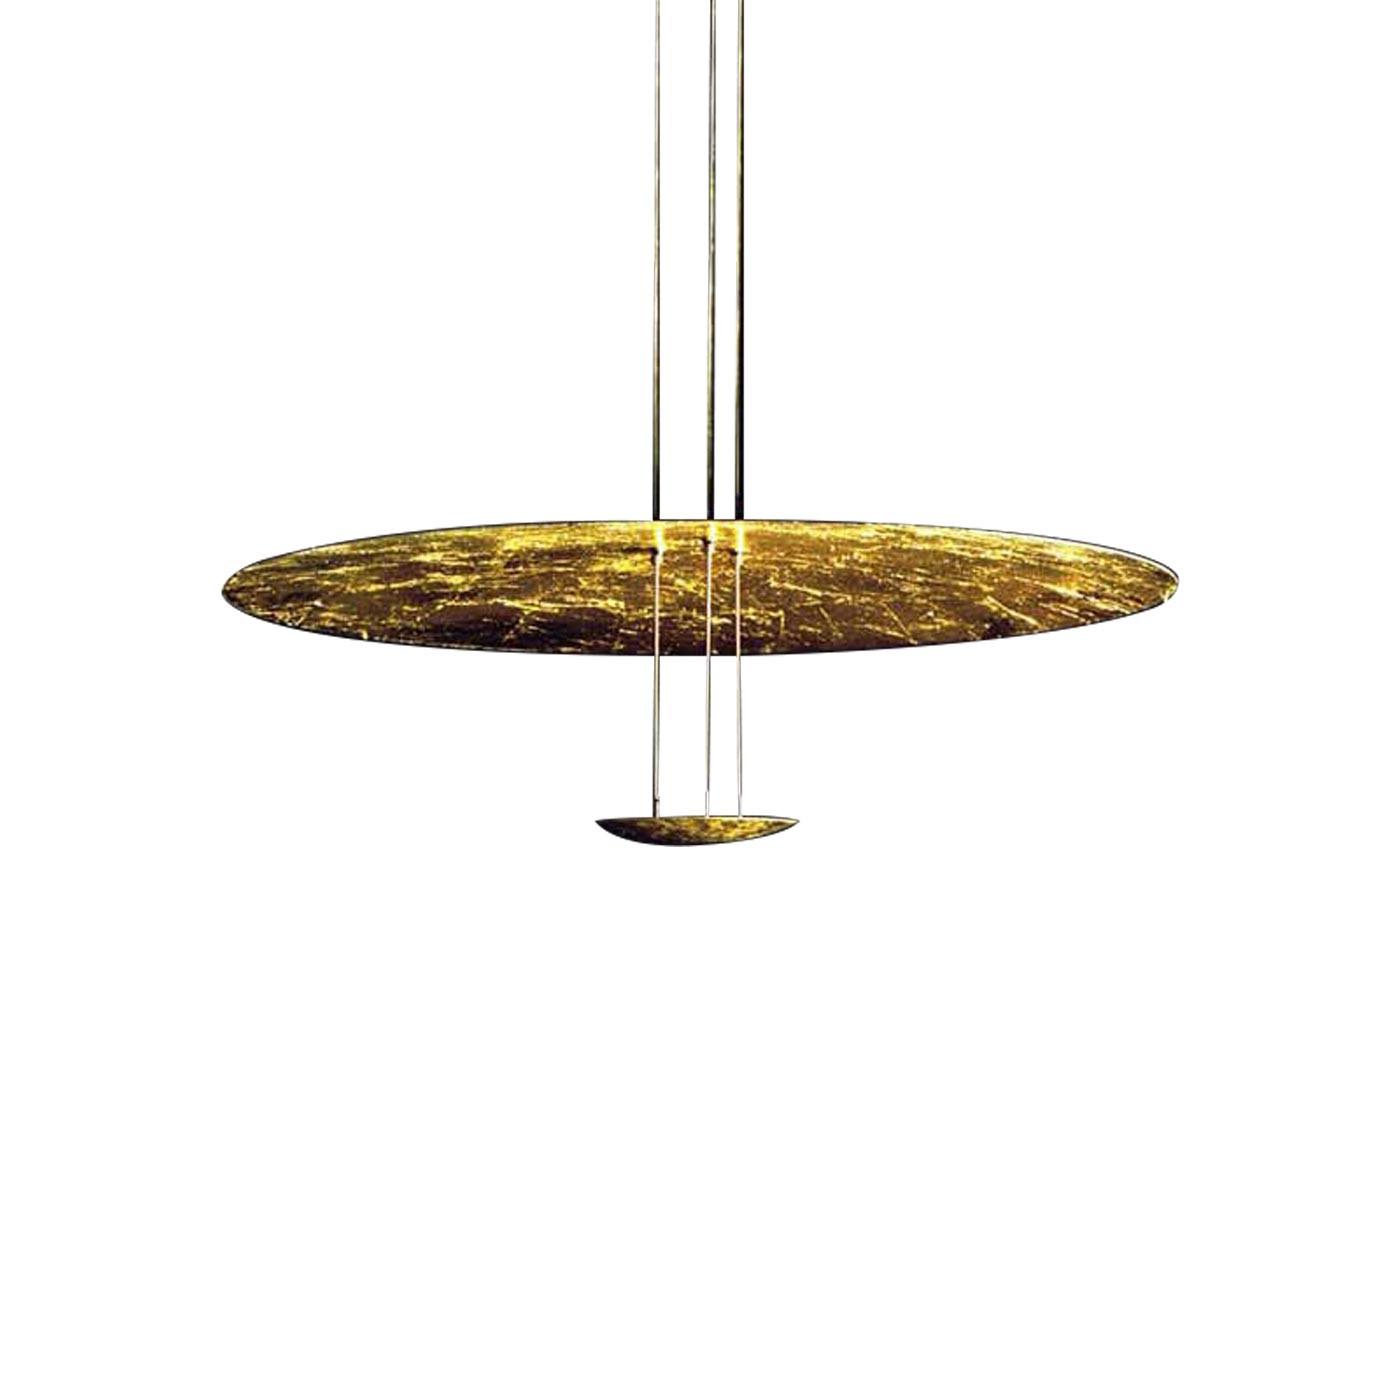 Catellani & Smith Macchina Della Luce mod. B LED